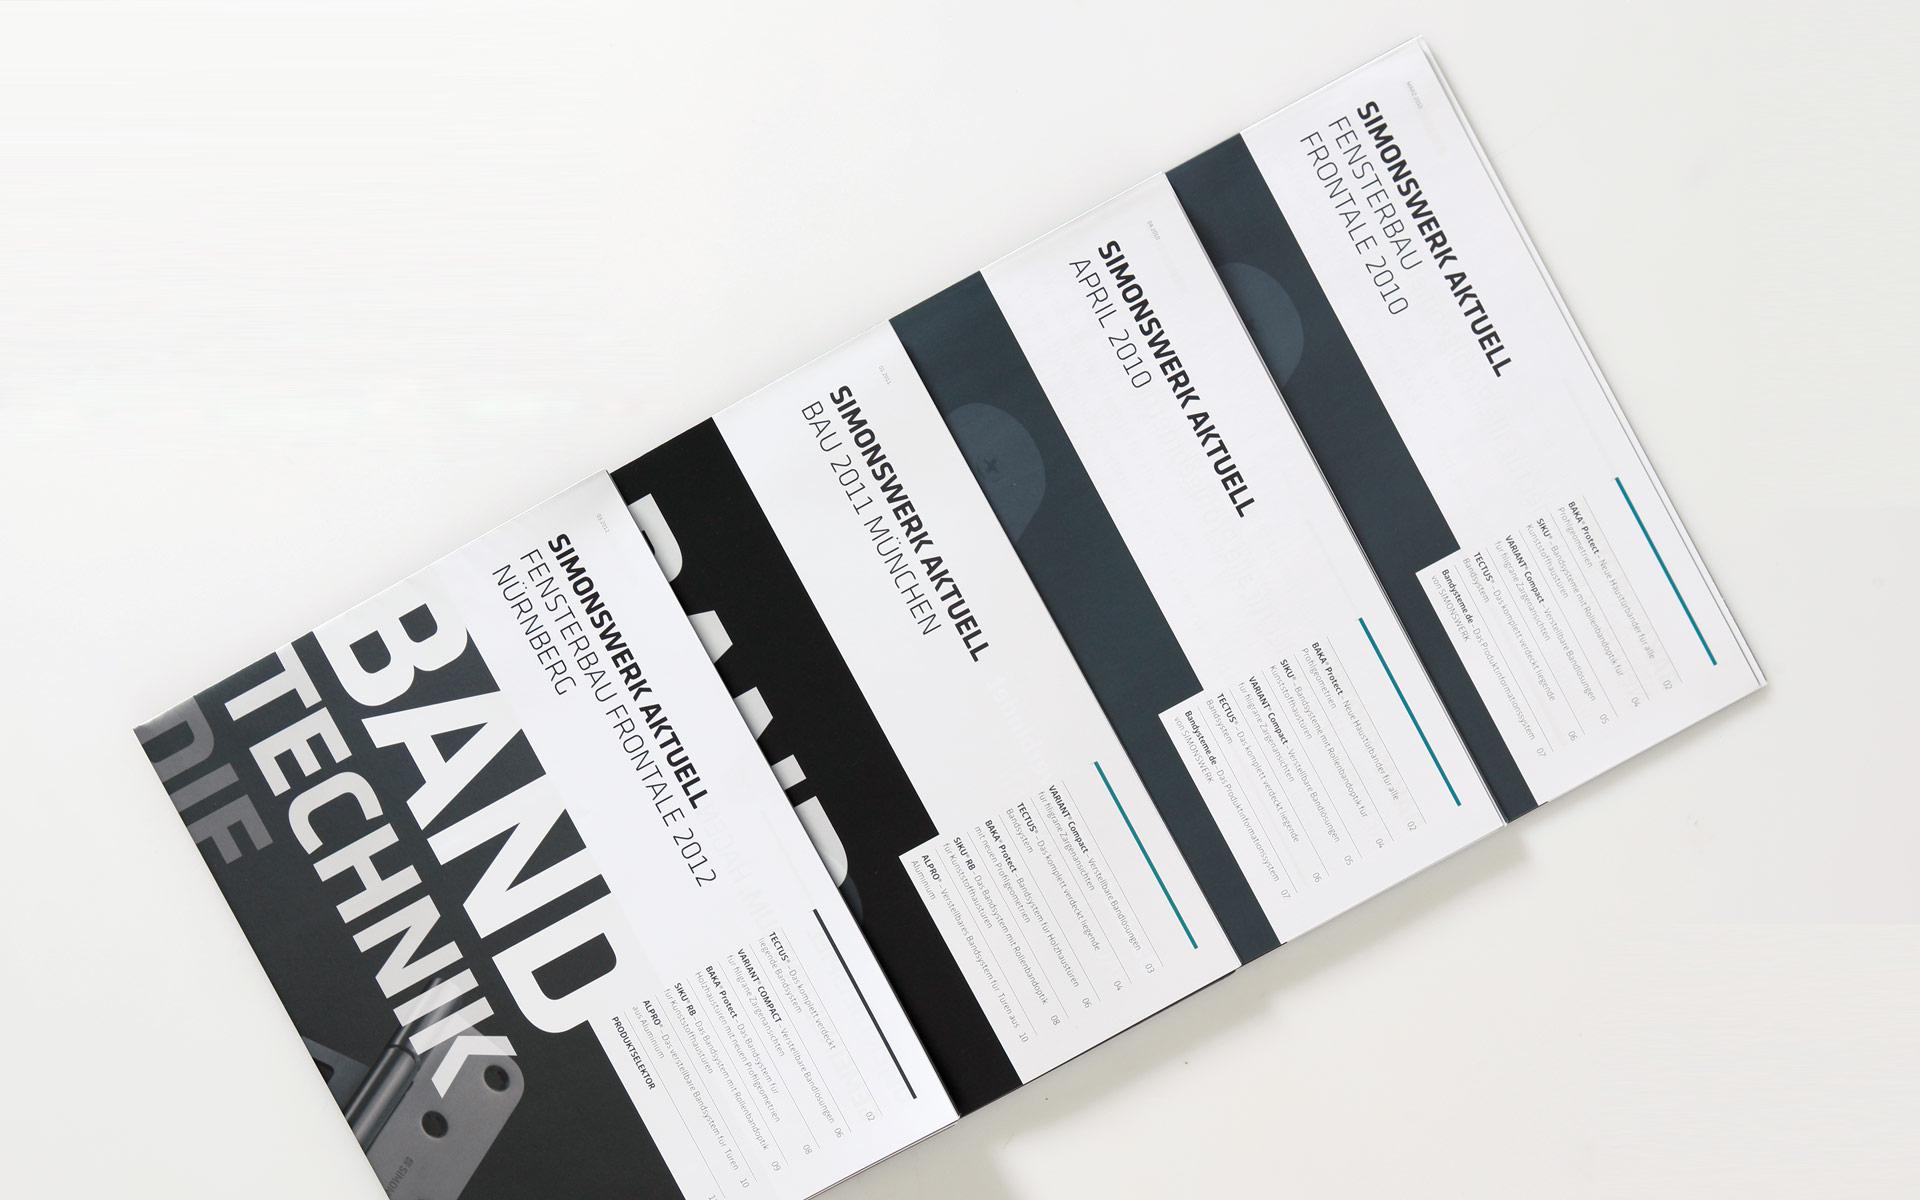 Simonswerk Broschürenwesen, Messemagazin, Titel